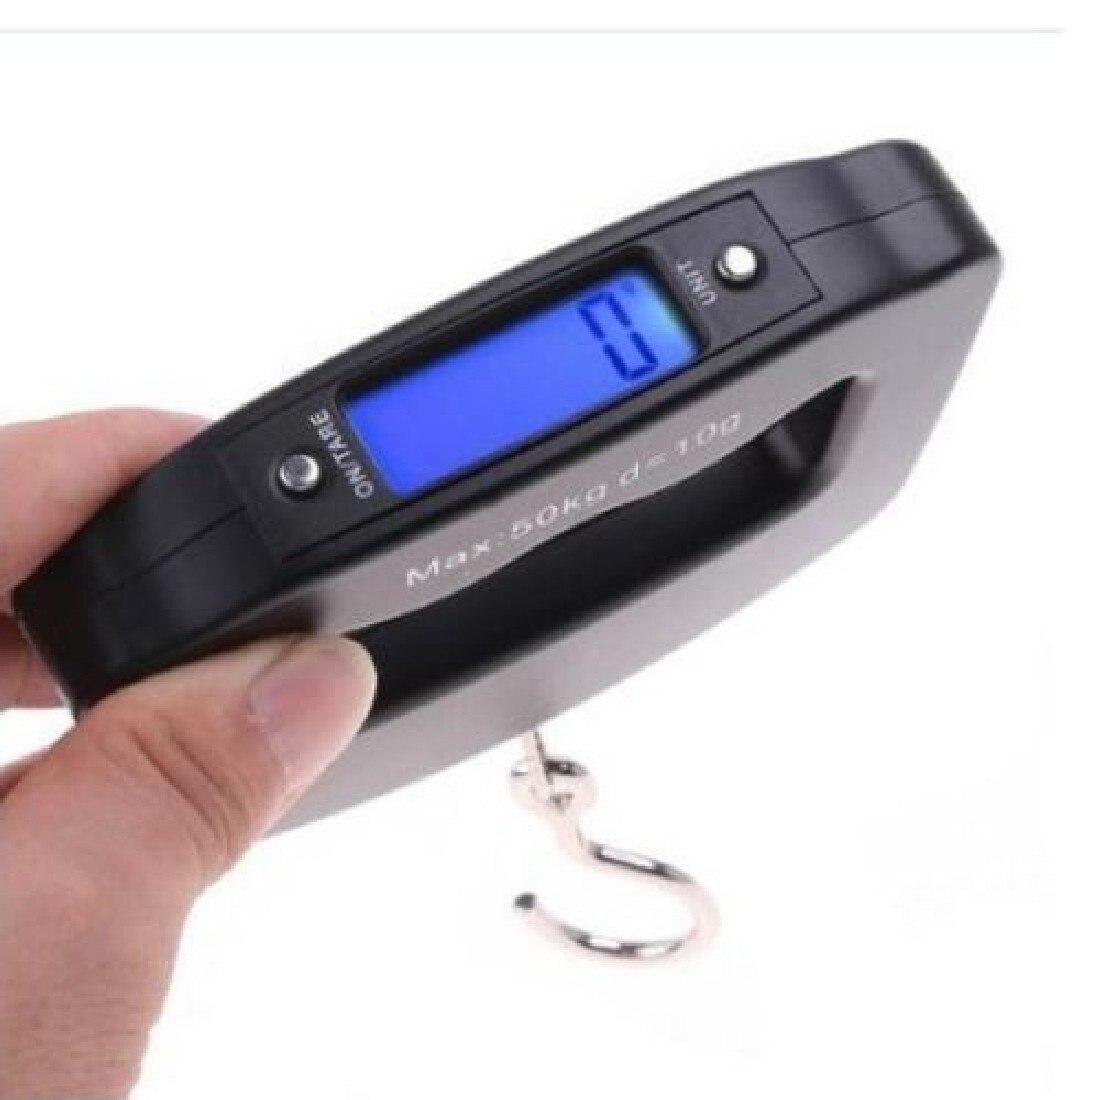 Balanza balanza para maleta bolsa de viaje equipaje pesa Digital Mini Balanza de pesca electrónica gancho colgante